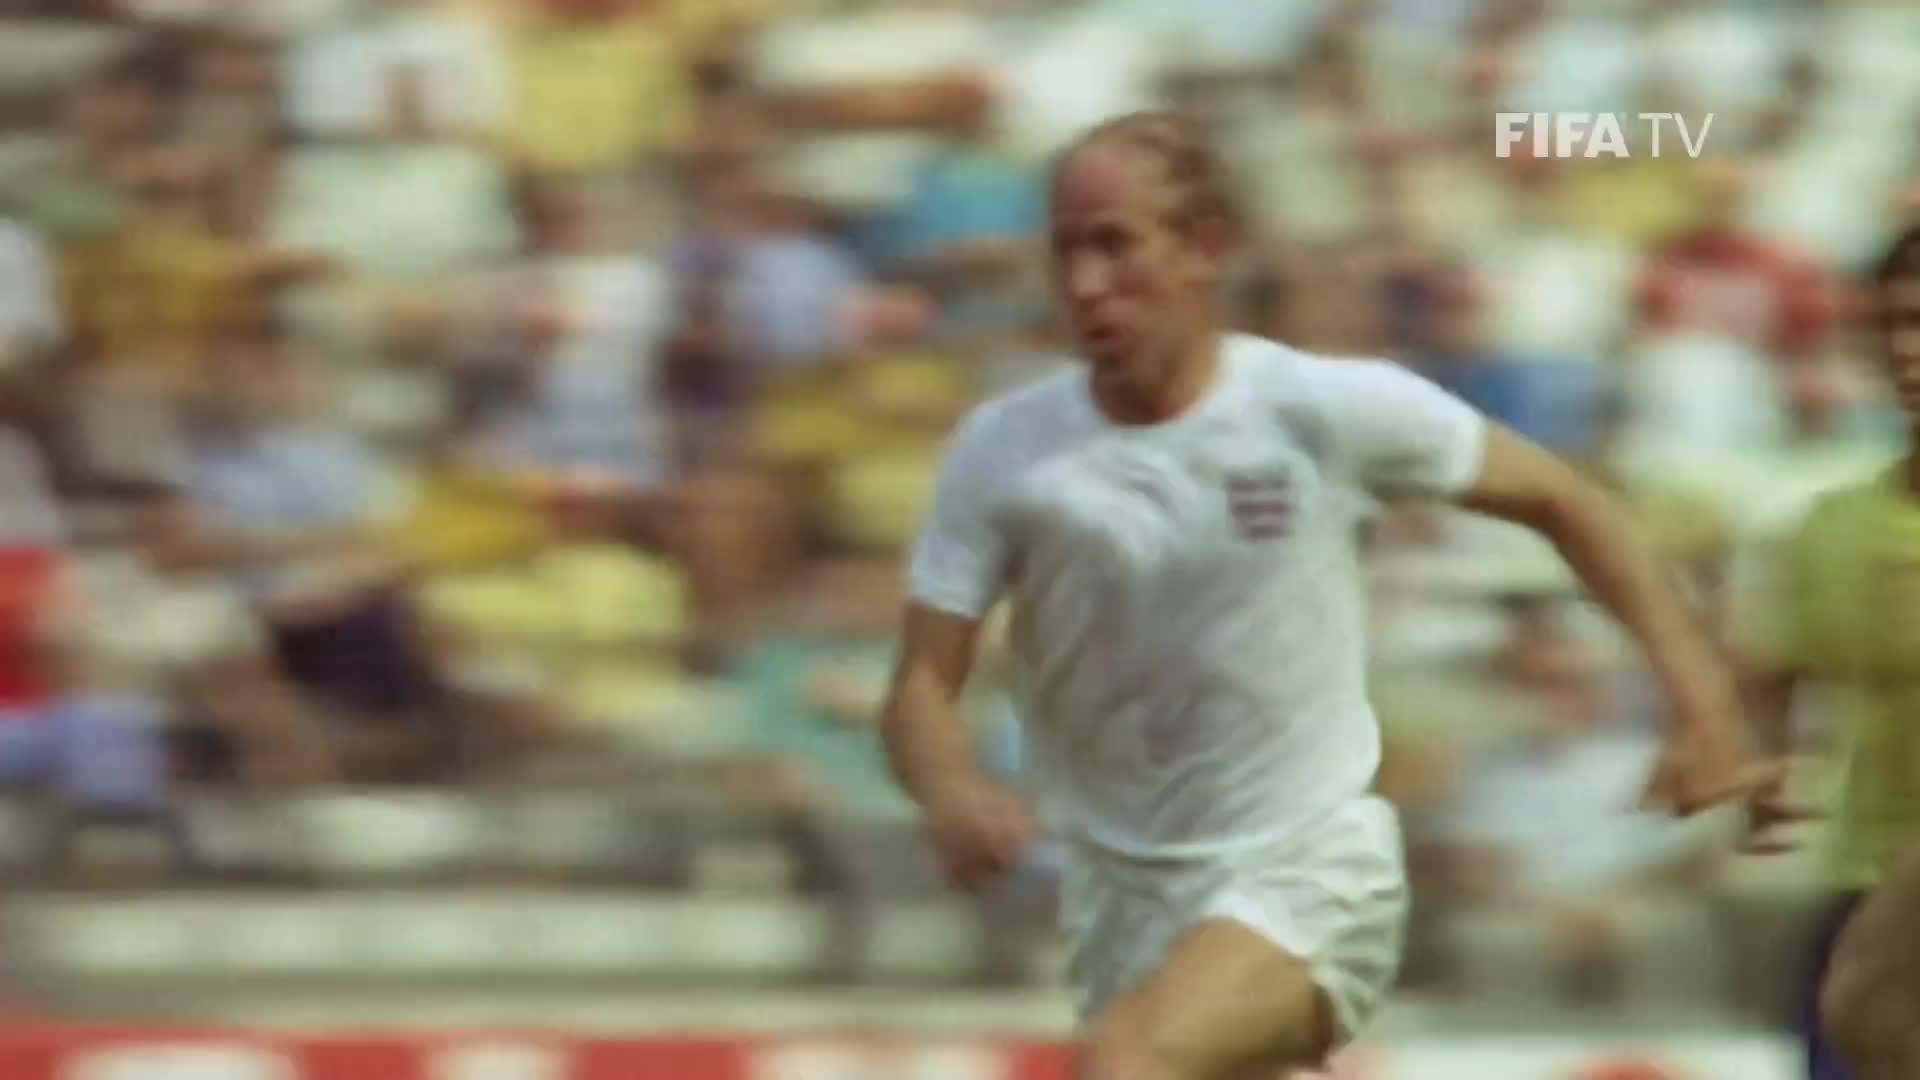 Calcio, FIFA, Football, Fussball, Futbol, Futebol, Fußball, Soccer, Voetbal, official, #TBT: Bobby CHARLTON - FIFA Classic Player GIFs